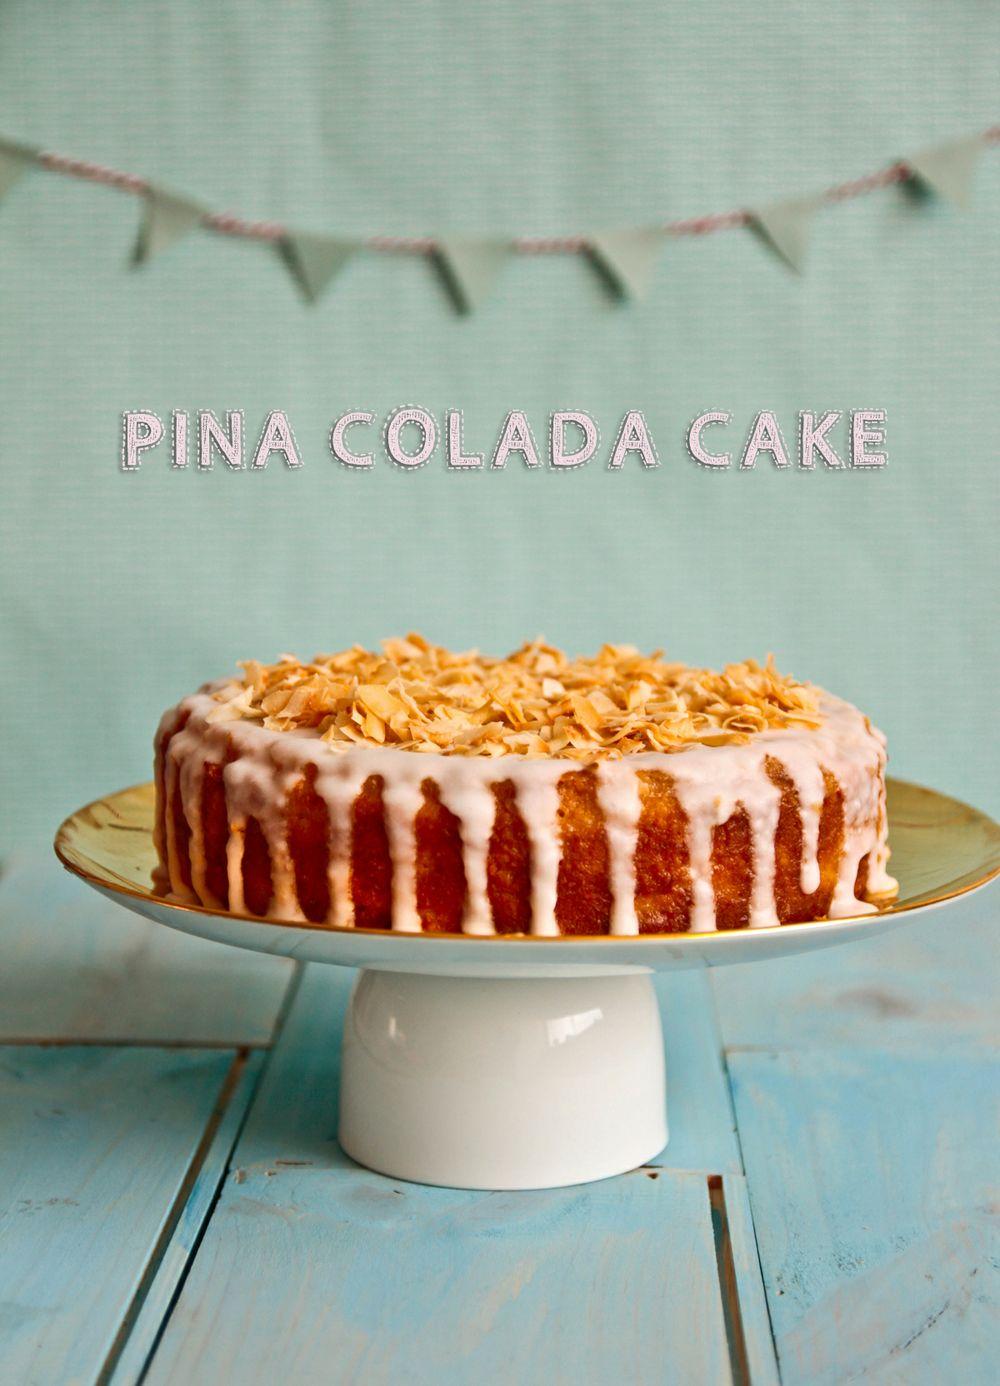 m2-pina-colada-cake-2-3